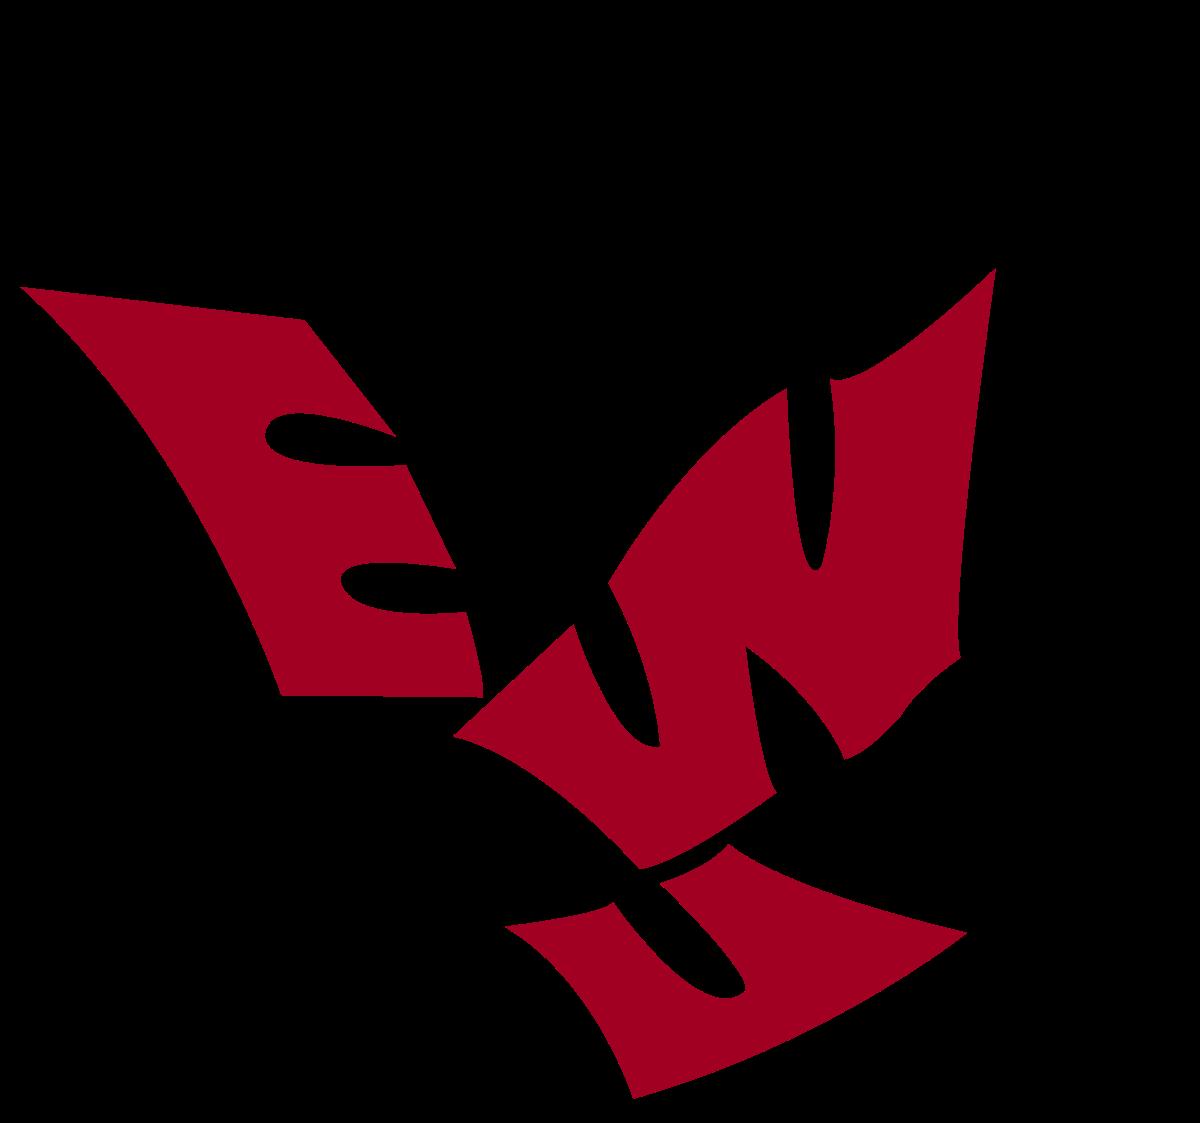 Clipart university of washington football vector library library Eastern Washington Eagles - Wikipedia vector library library